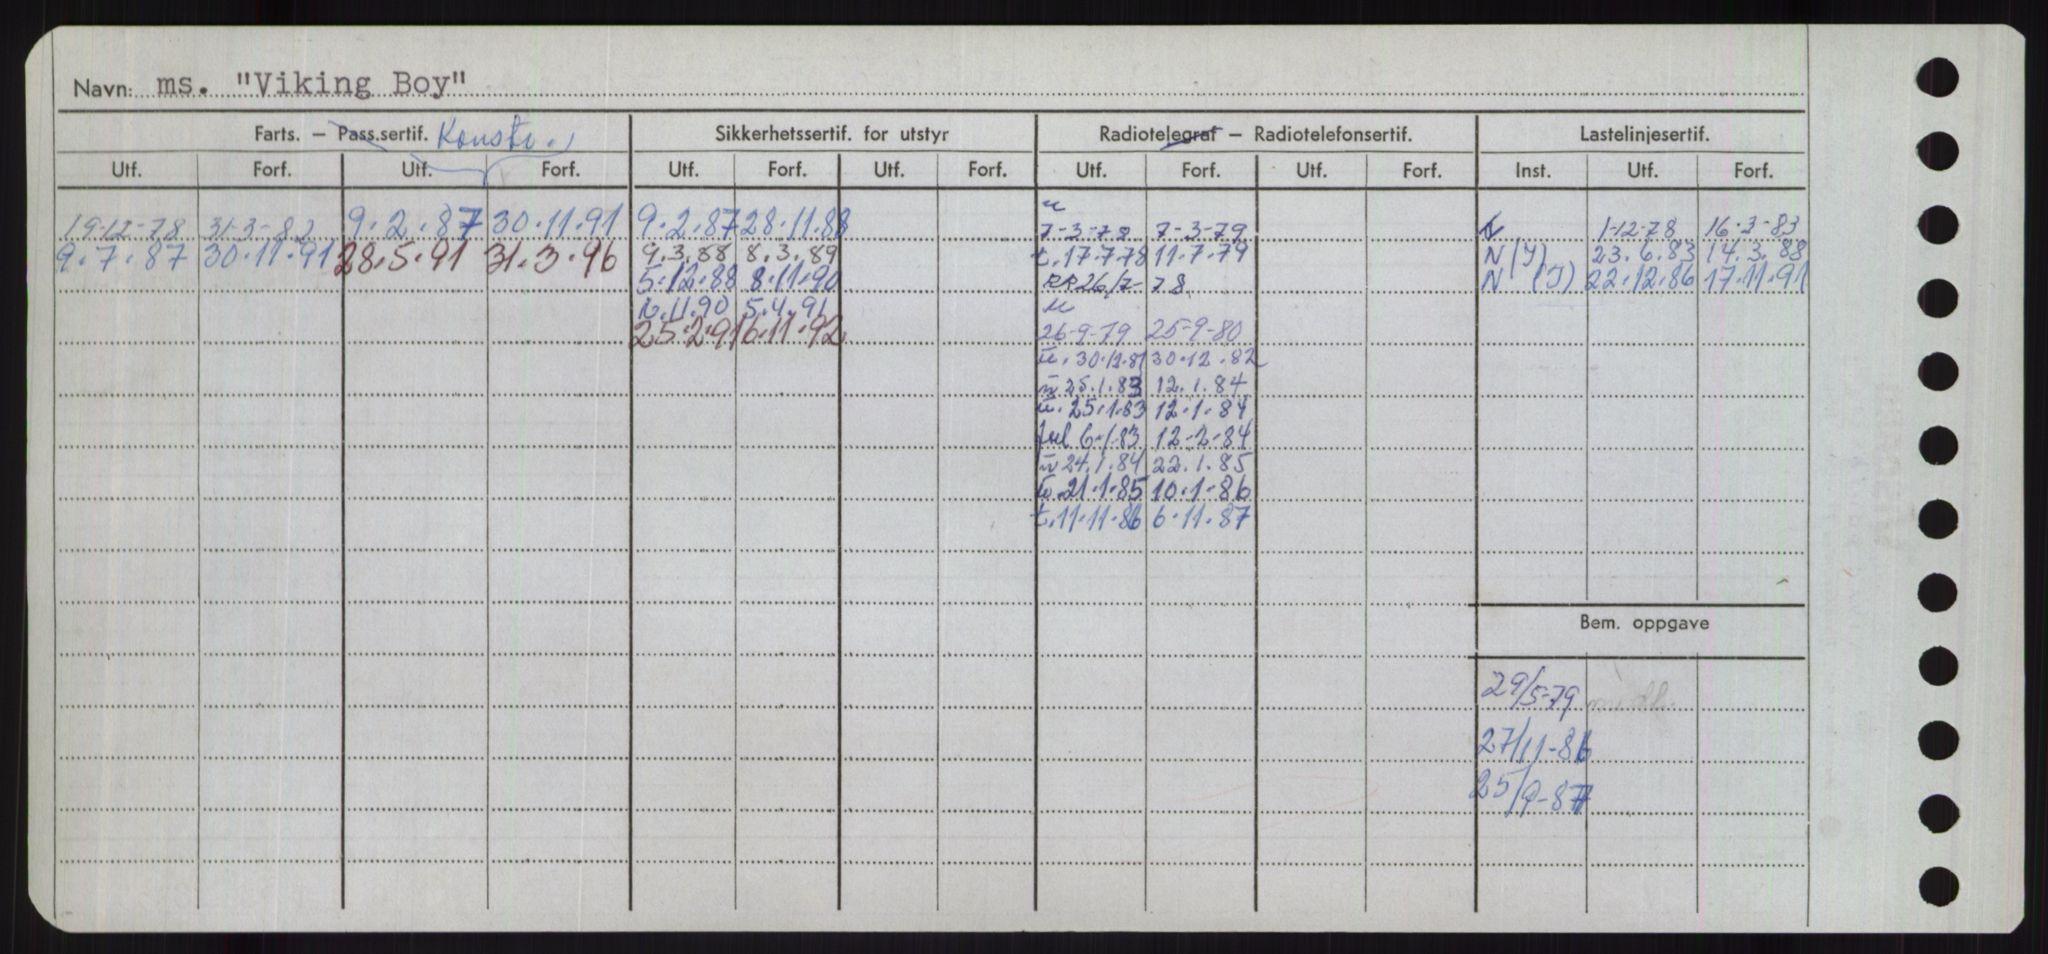 RA, Sjøfartsdirektoratet med forløpere, Skipsmålingen, H/Ha/L0006: Fartøy, Sver-Å, s. 456